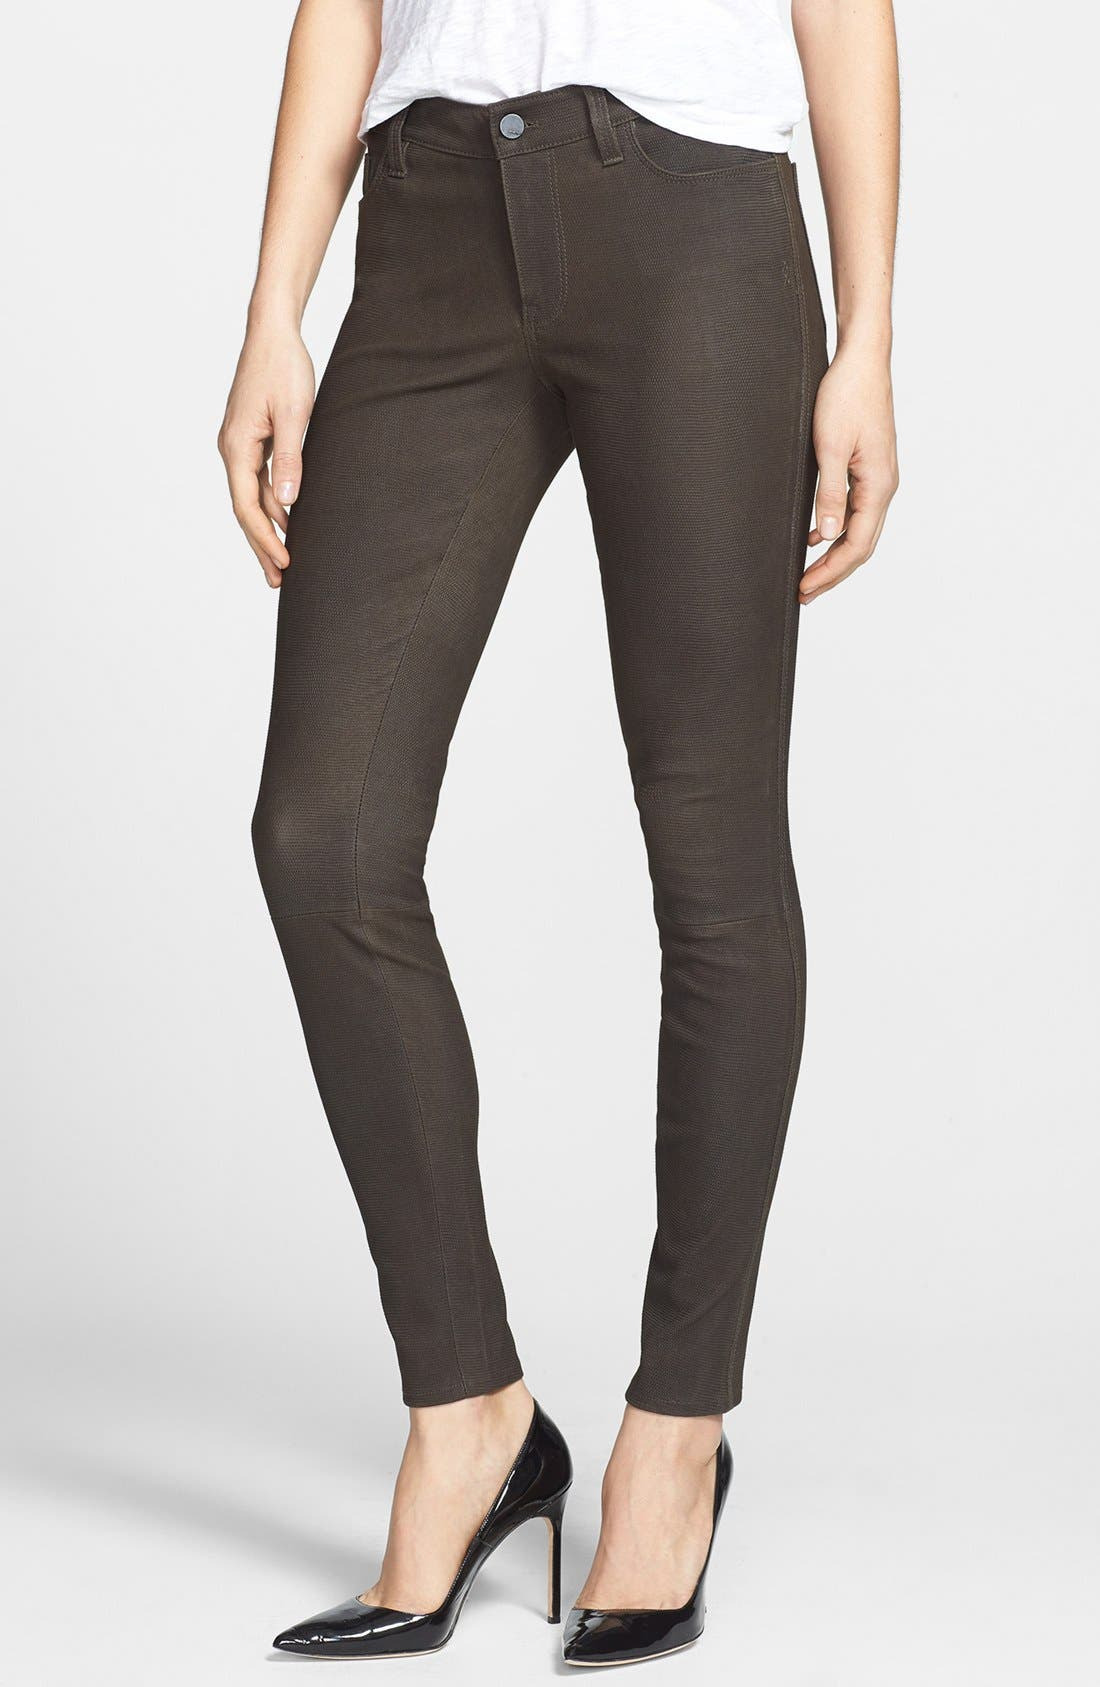 Alternate Image 1 Selected - Genetic 'Shya' Suede Cigarette Jeans (Deep Olive)